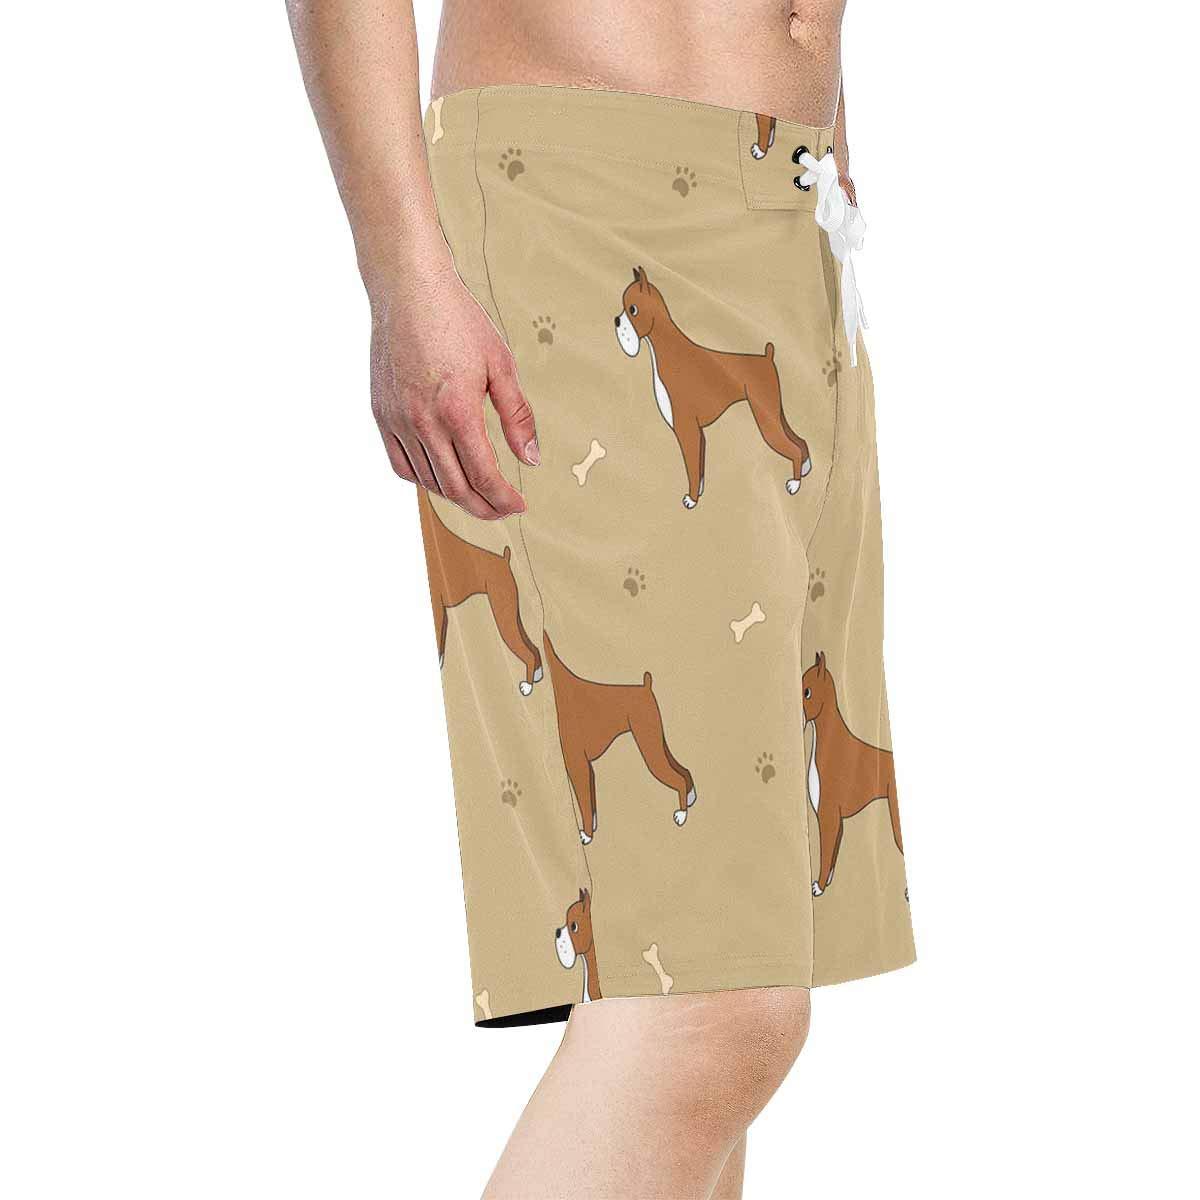 XS-6XL INTERESTPRINT Mens Board Water Shorts Cartoon Cute Dogs Quick Dry Swim Trunks